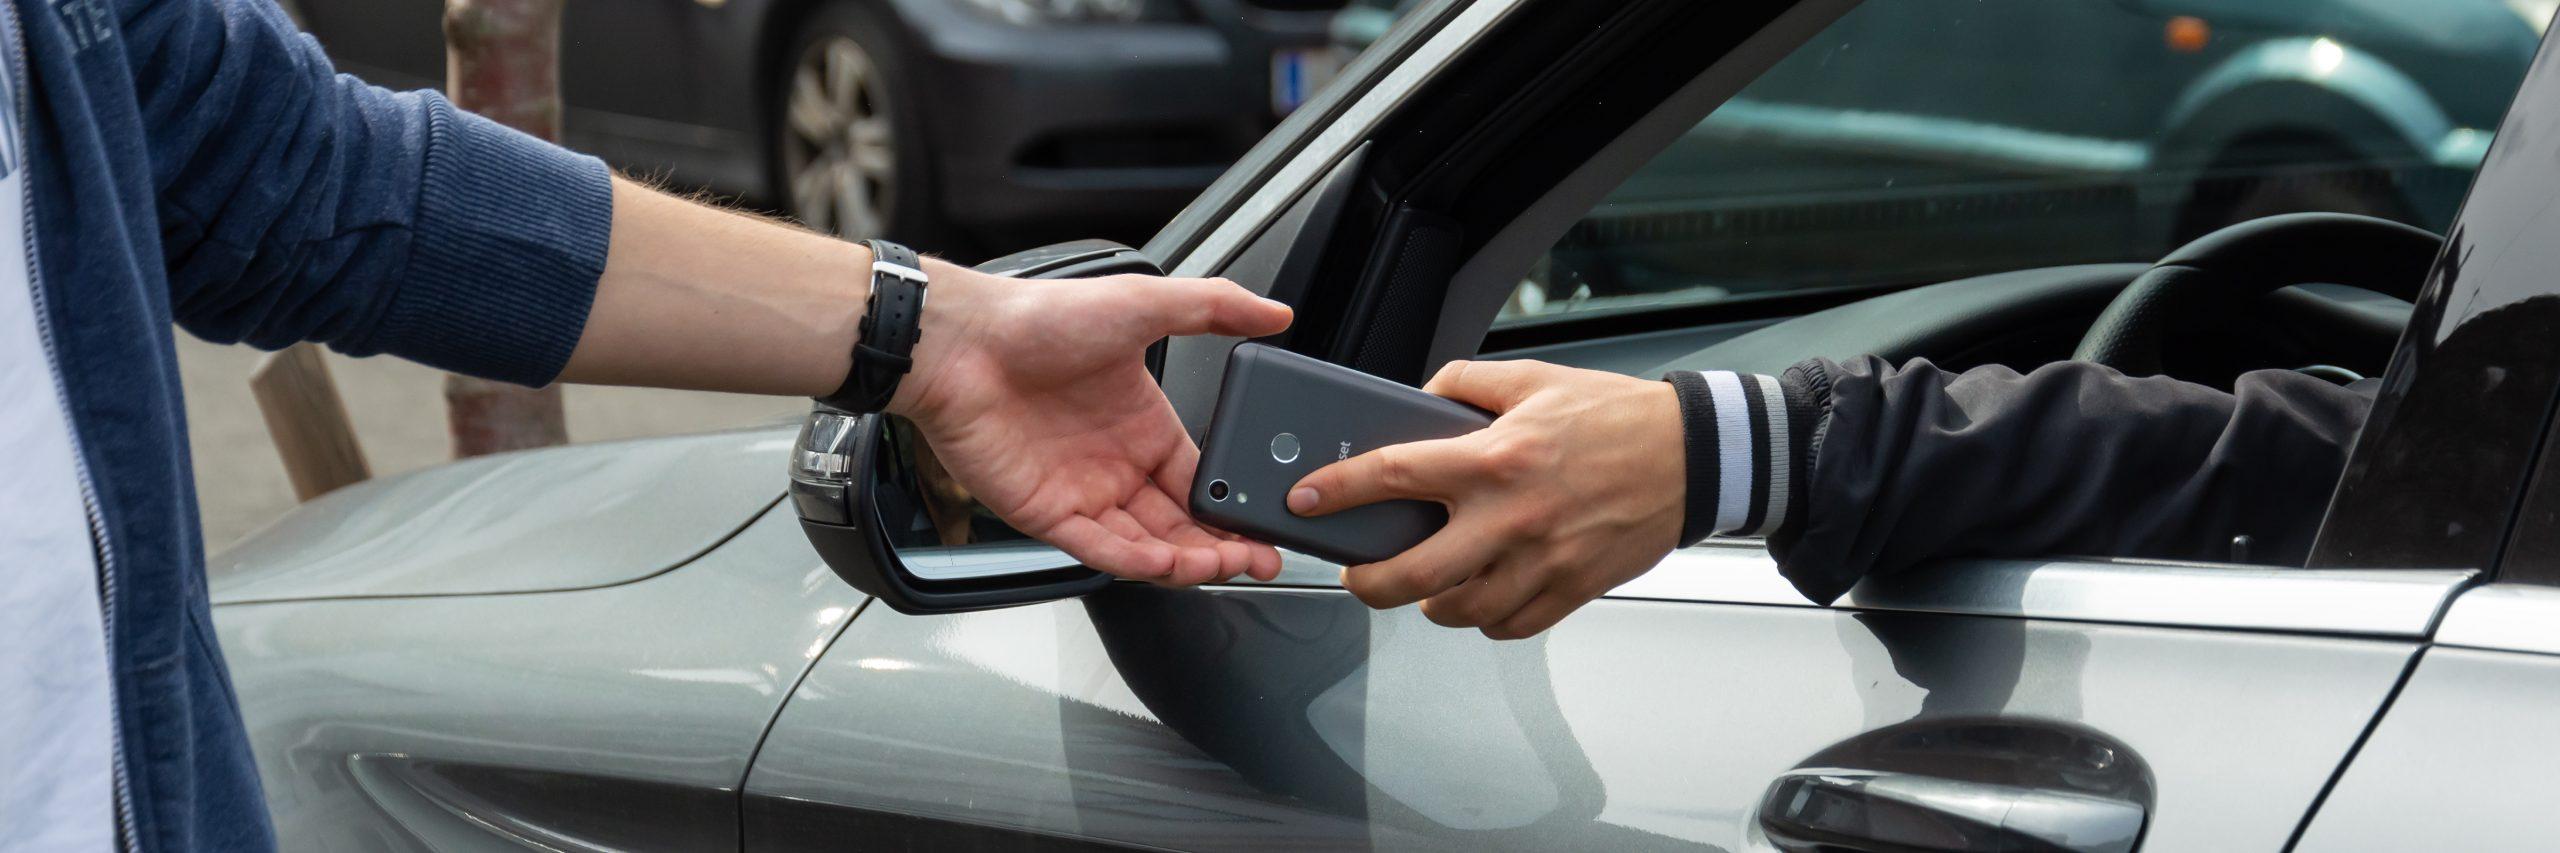 Handy Übergabe am Auto; Hände; Handy; Smartphone; P2P-Sharing; Peer to Peer Sharing